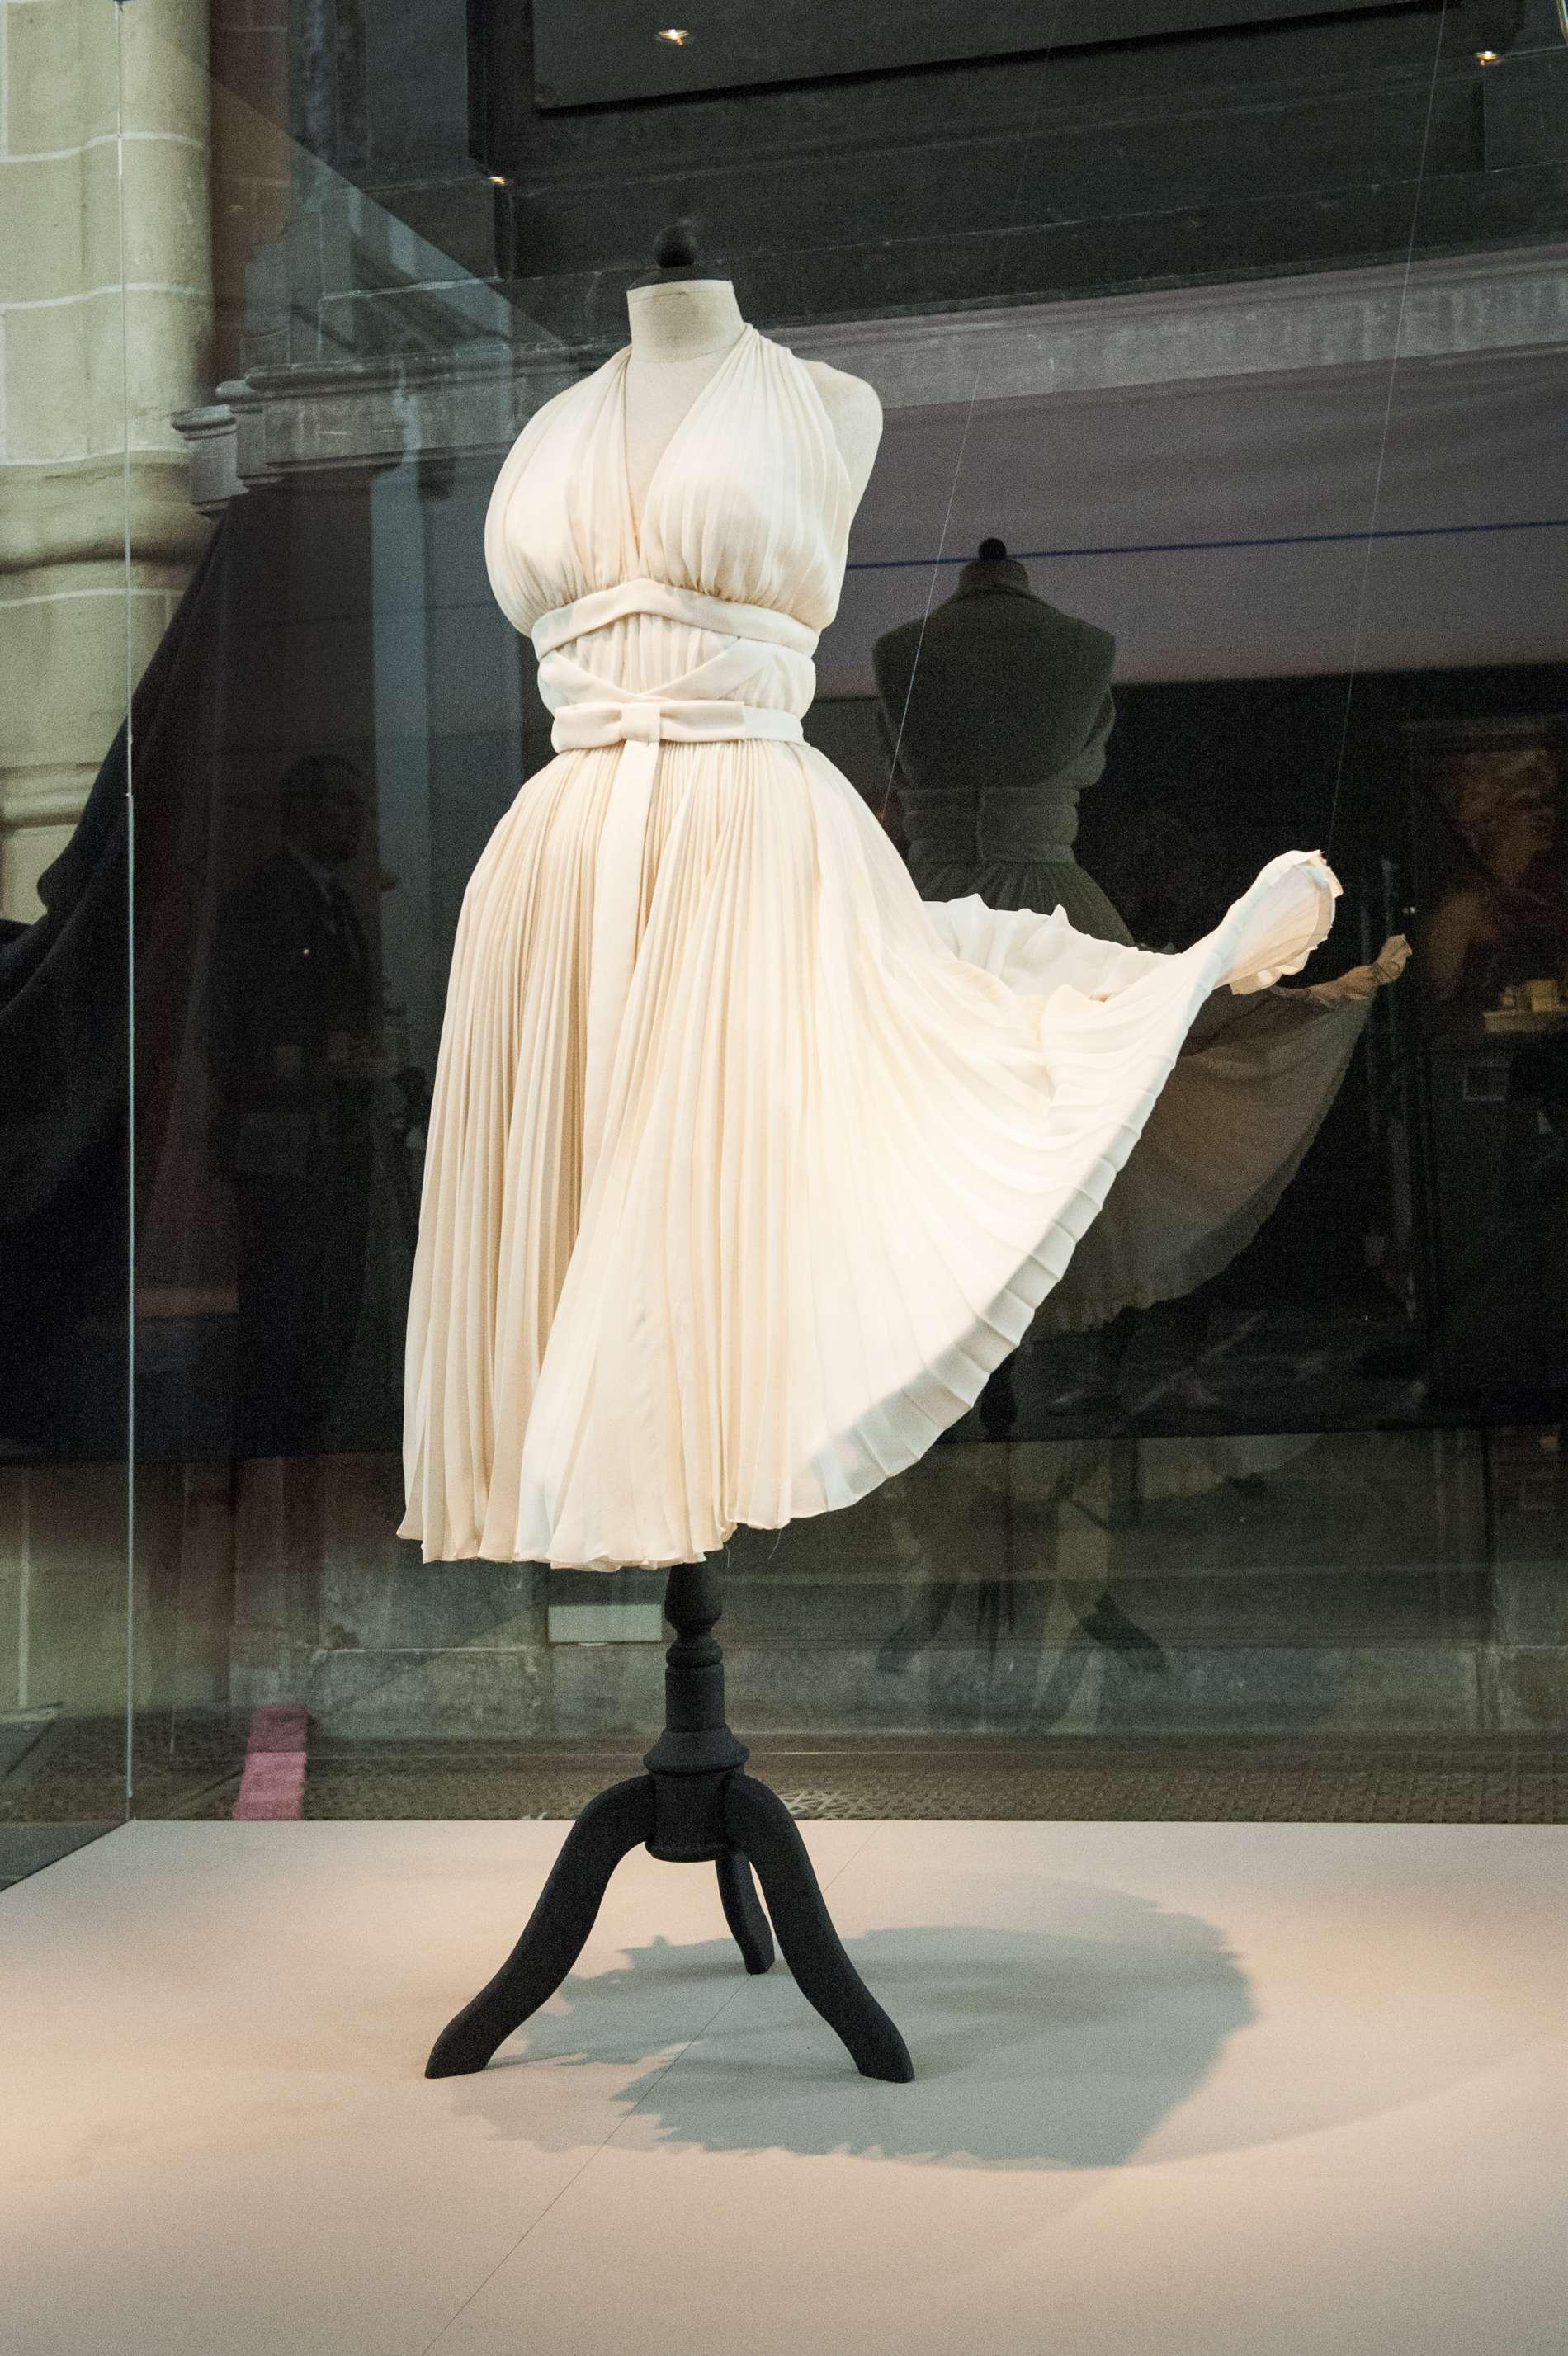 ad6286492ee Opwaaiende witte jurk Marilyn Monroe aangekomen - De Nieuwe Kerk ...